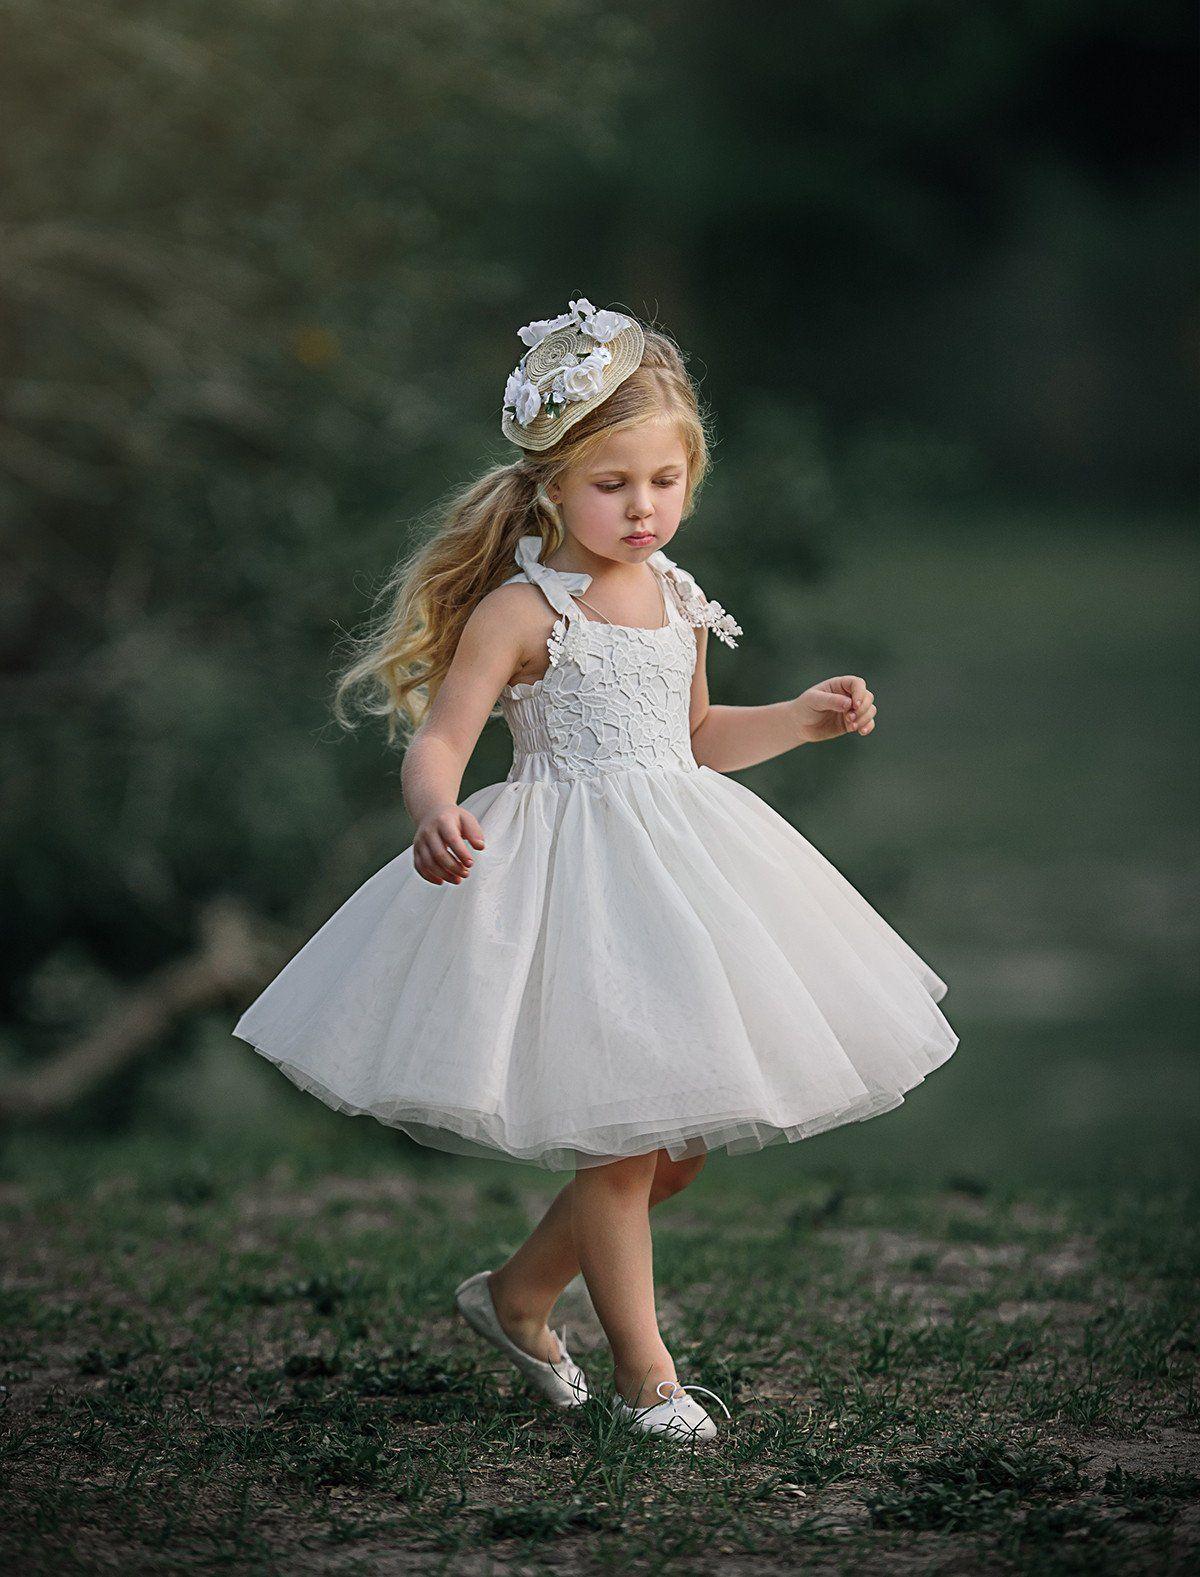 Tiptoeing Around Dress Sleeveless Flower Girl Dresses